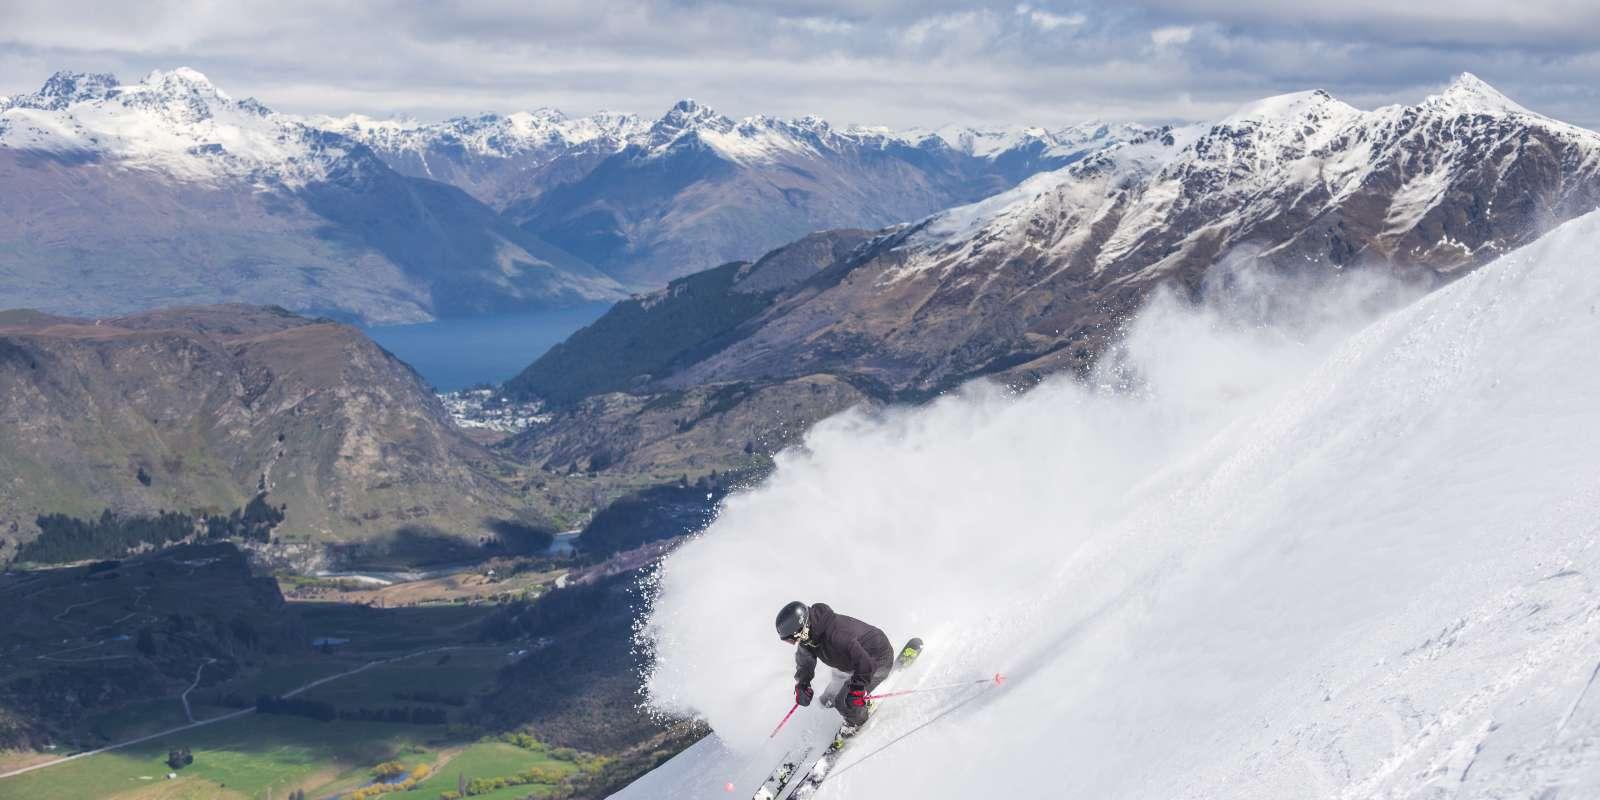 Skiing at Coronet Peak